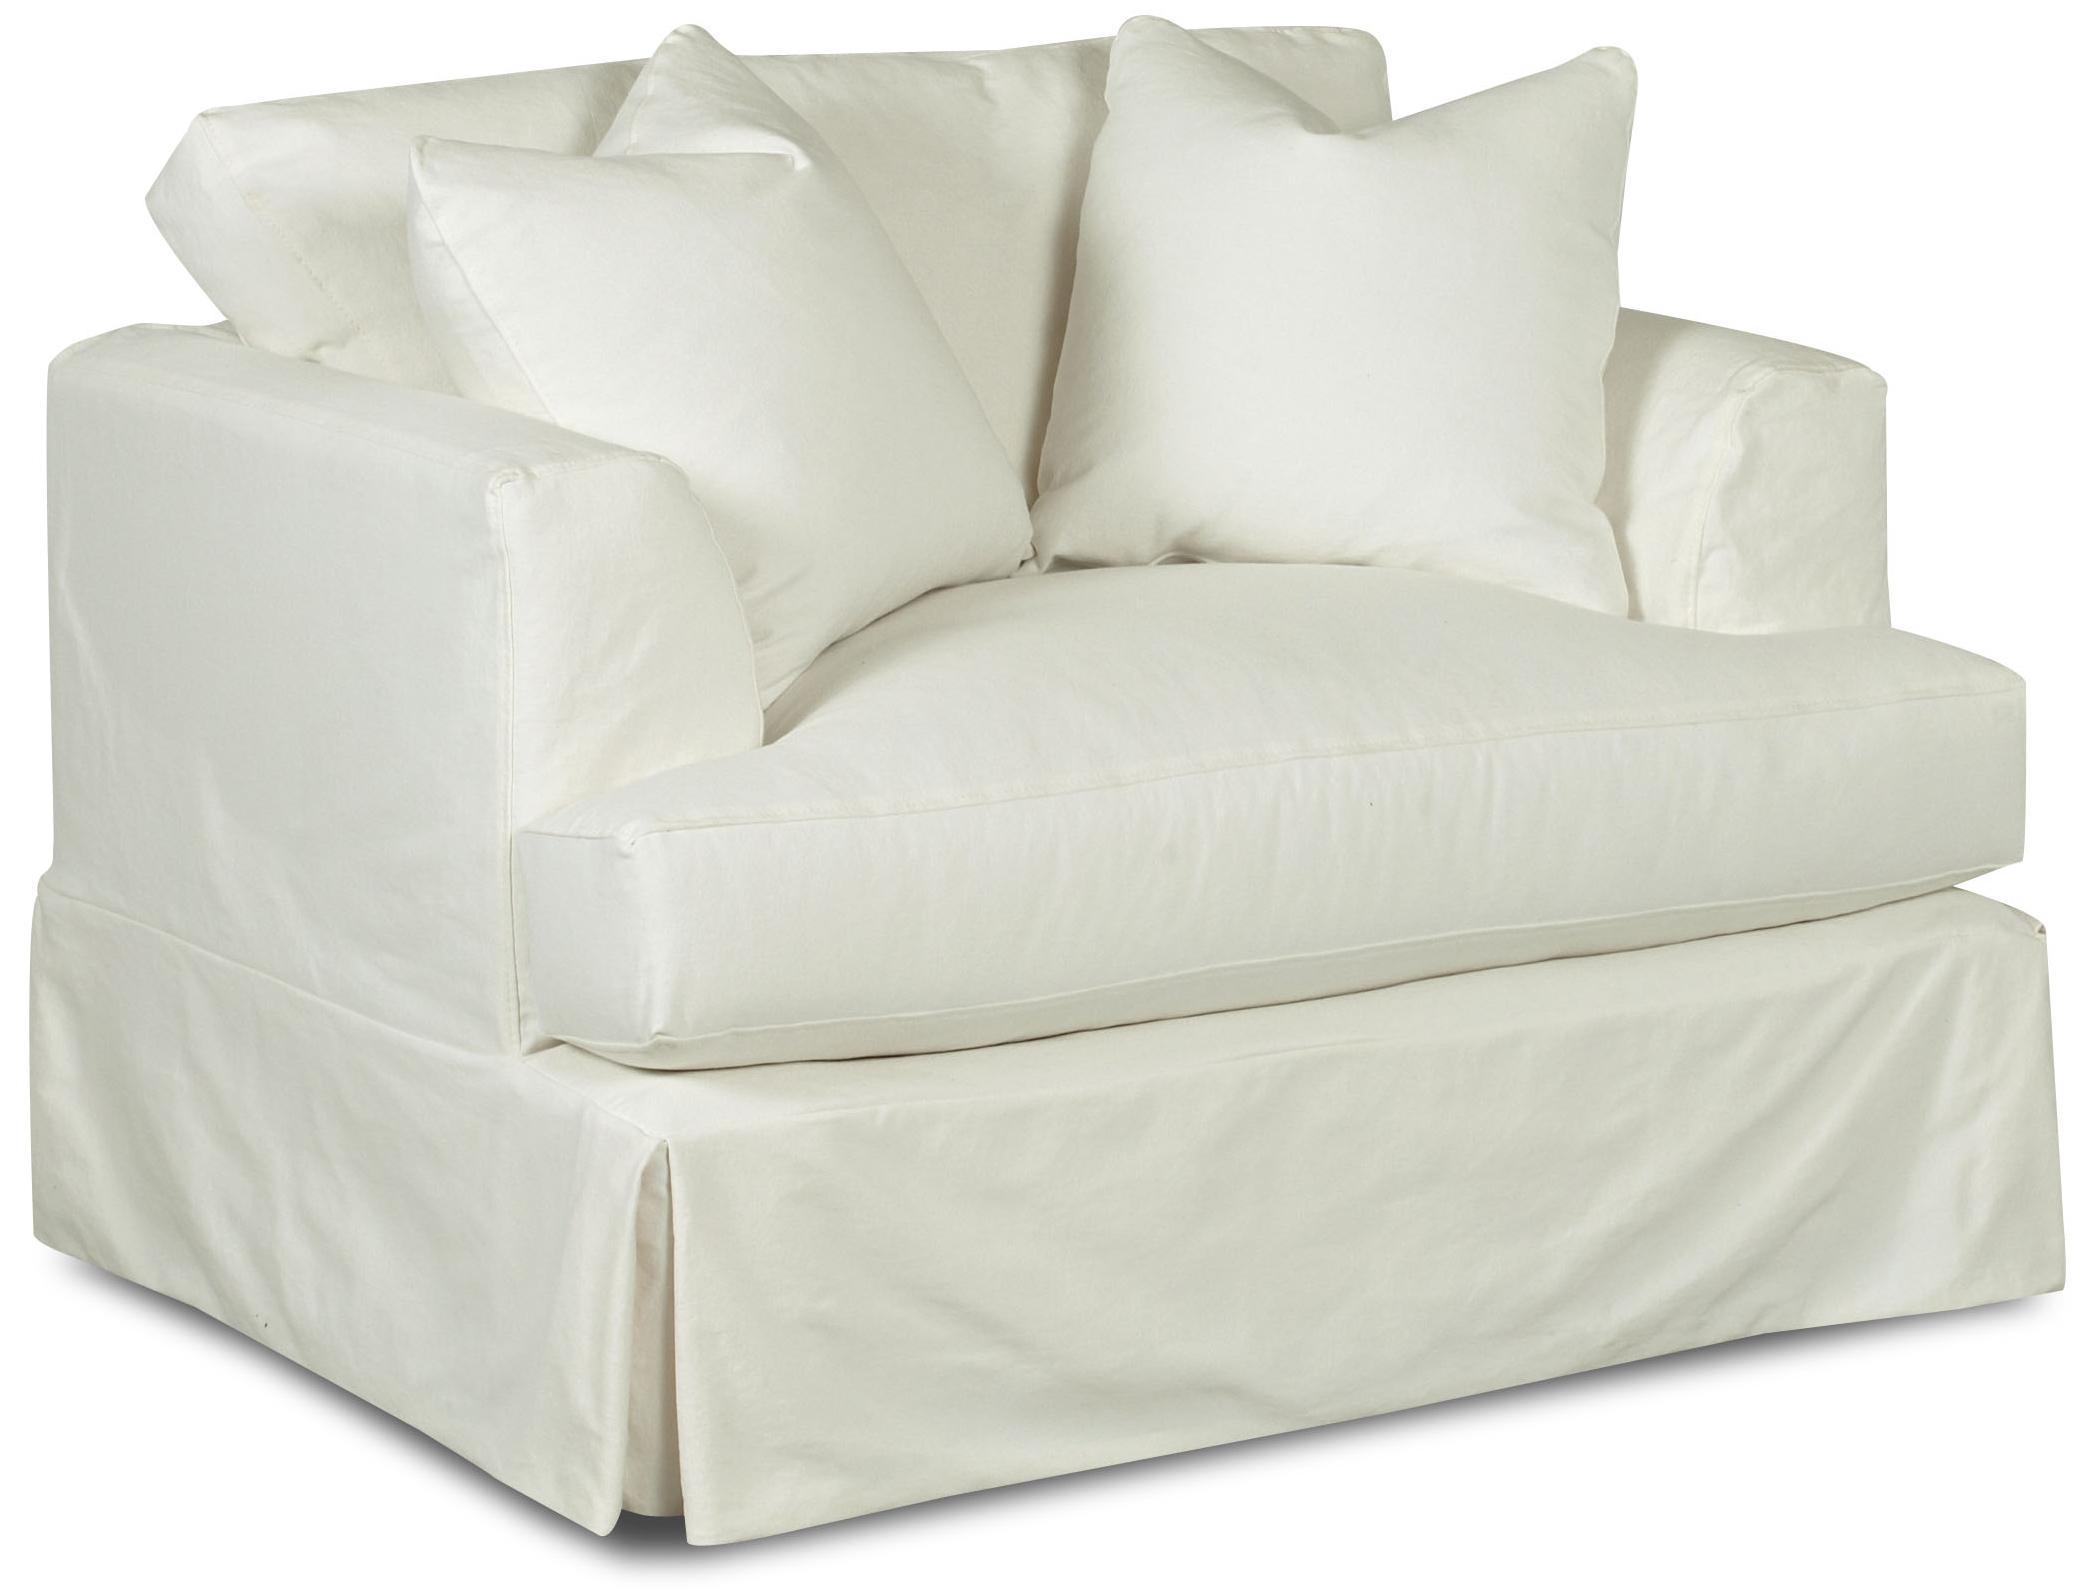 Quality Furniture in Orlando